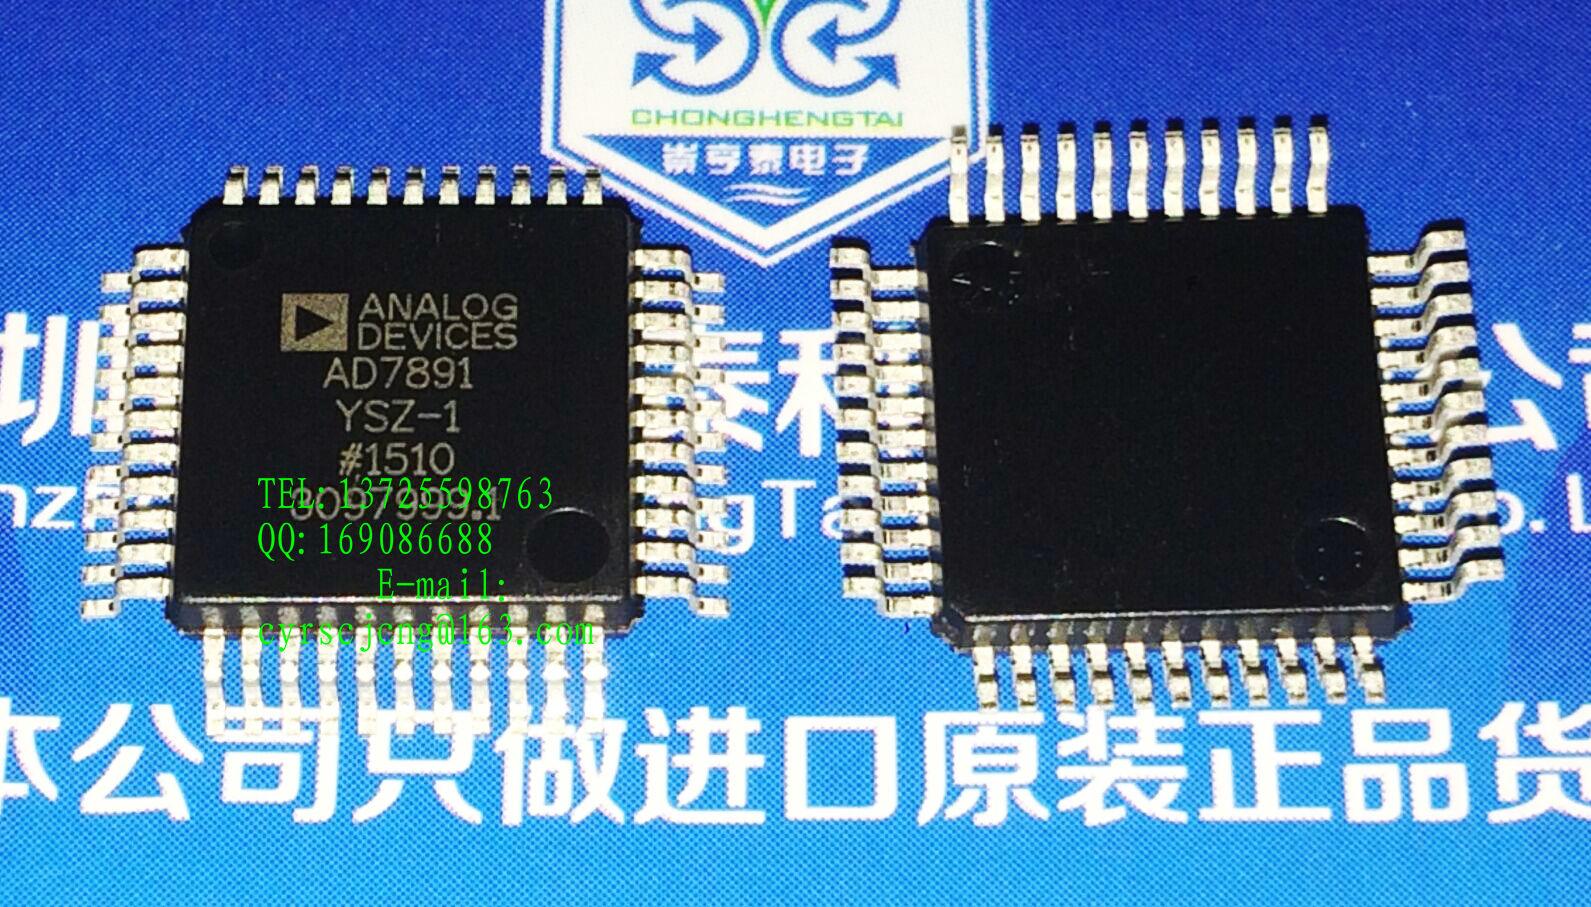 IC AD7891 AD7891YSZ-1  Original authentic and new Free Shipping IC  цены онлайн